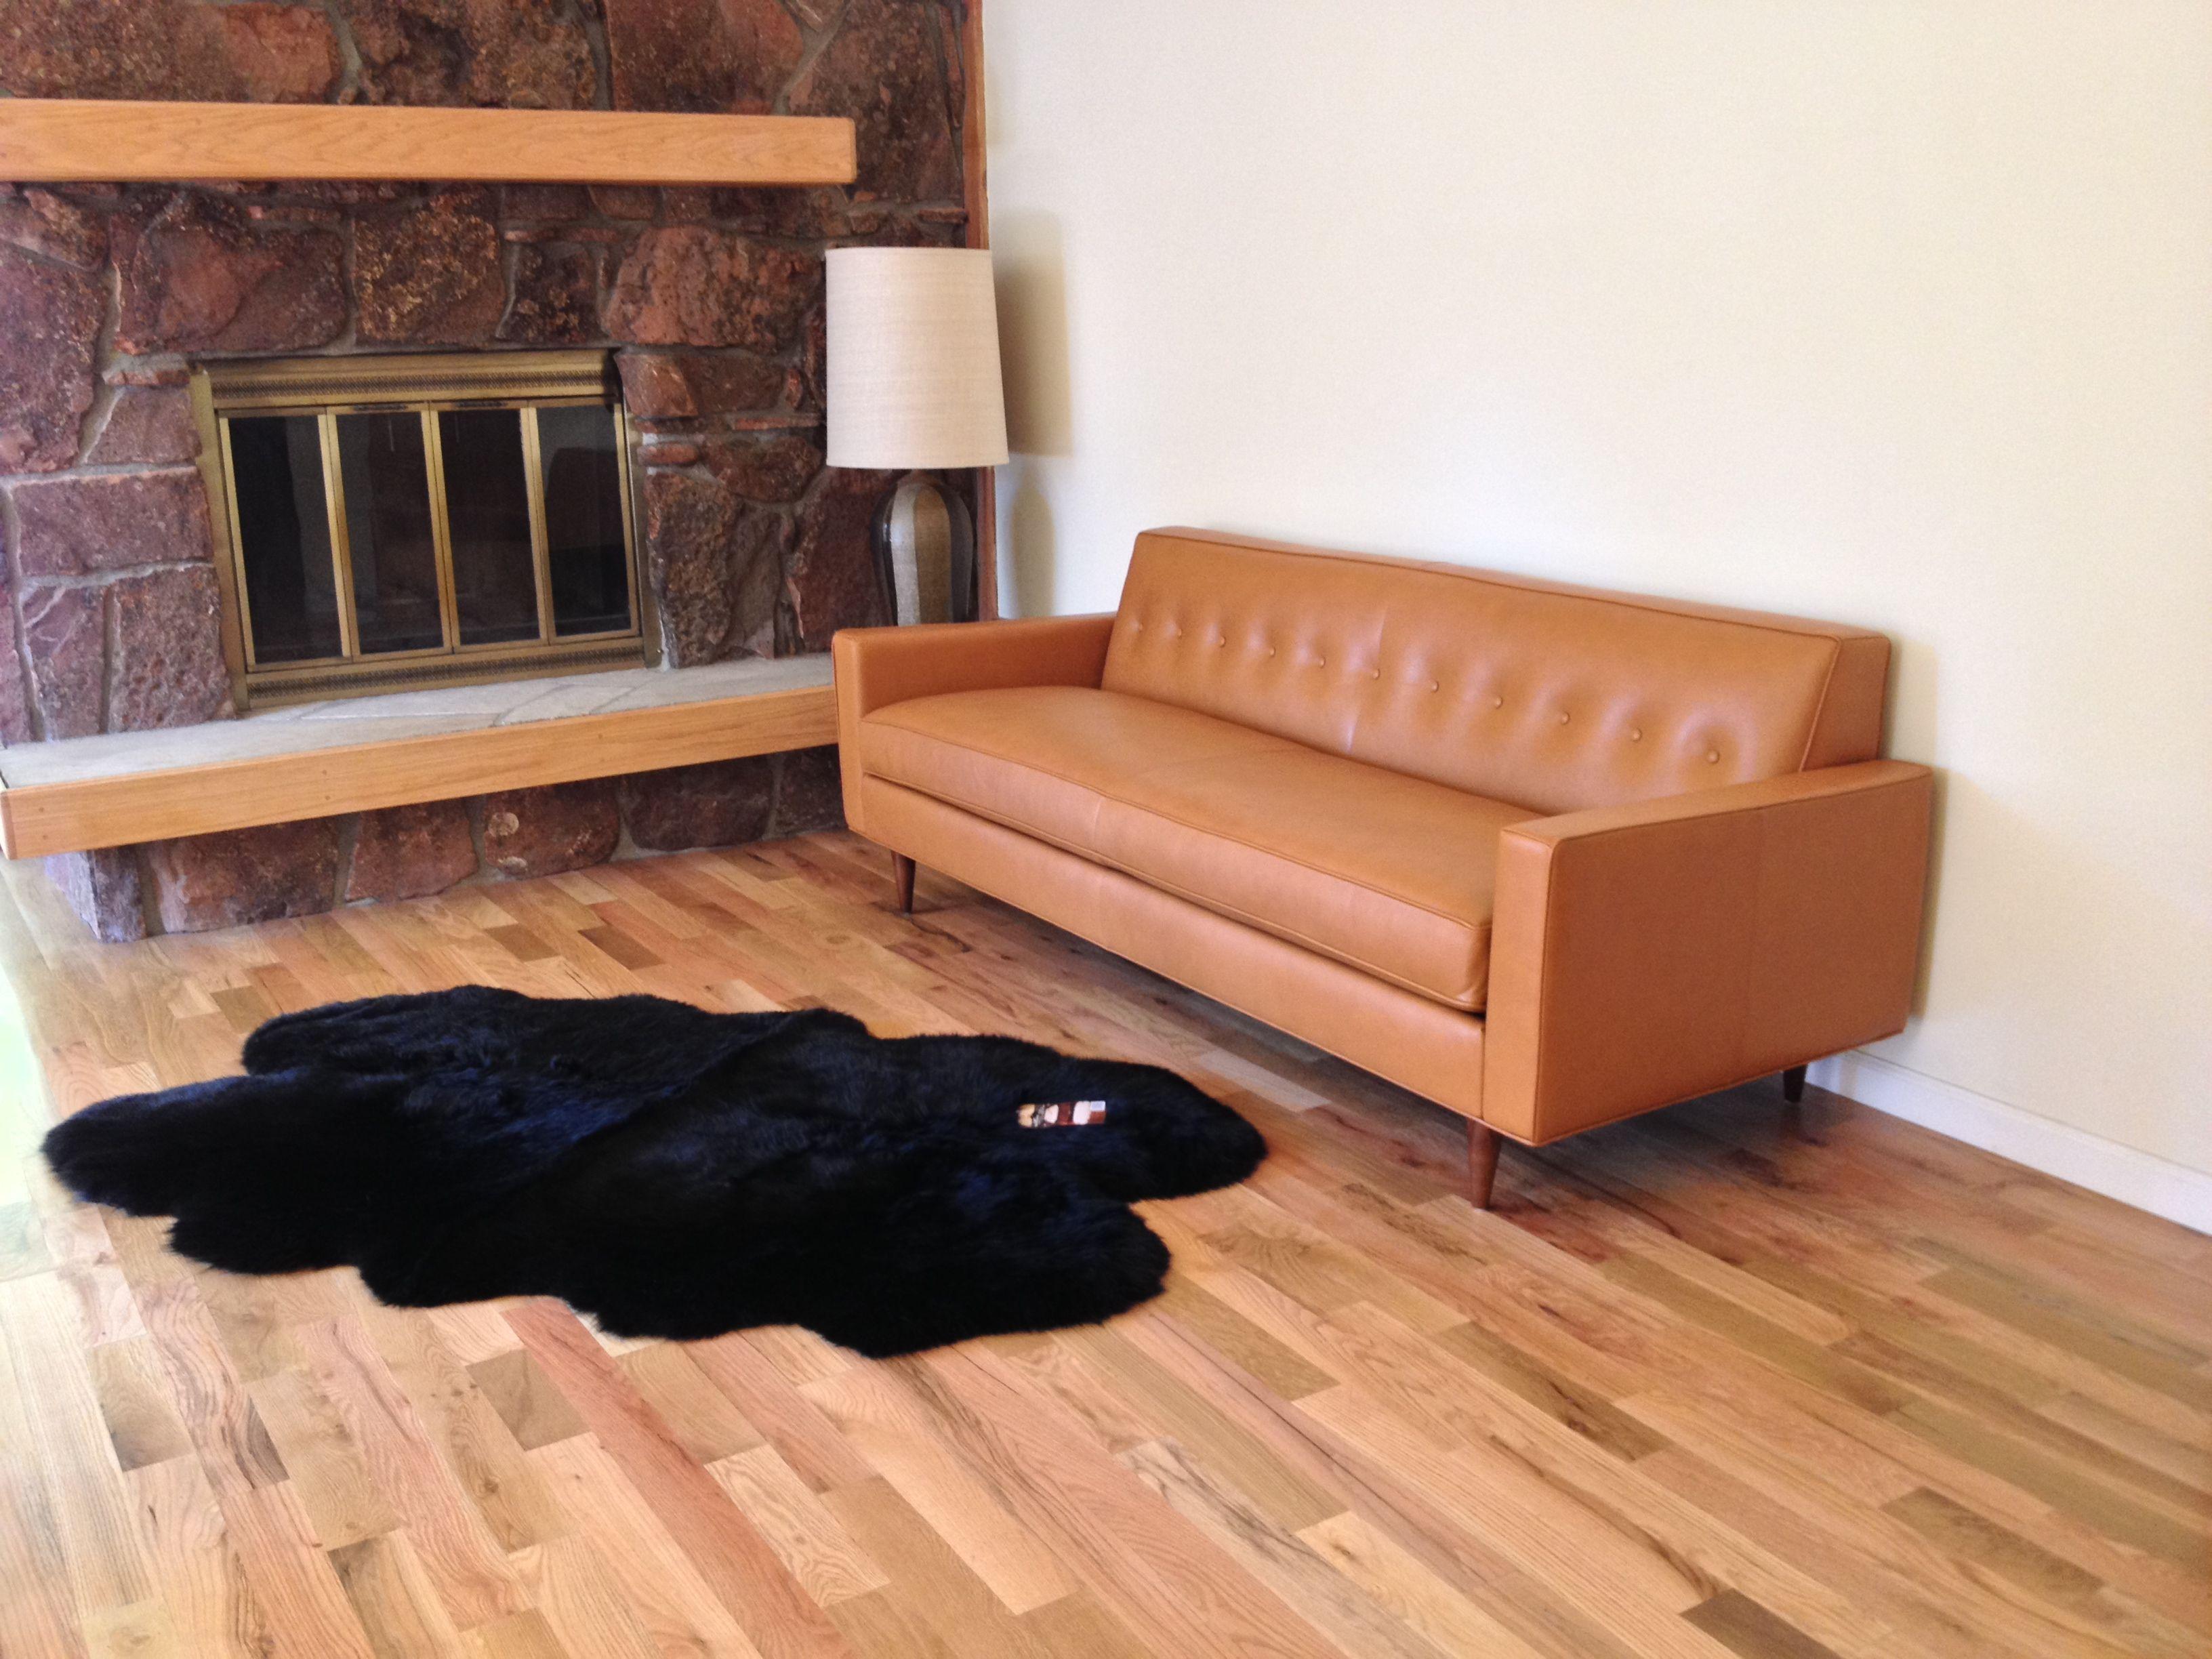 Design Within Reach Bantam Sofa In Leather Warm Mid Century Modern